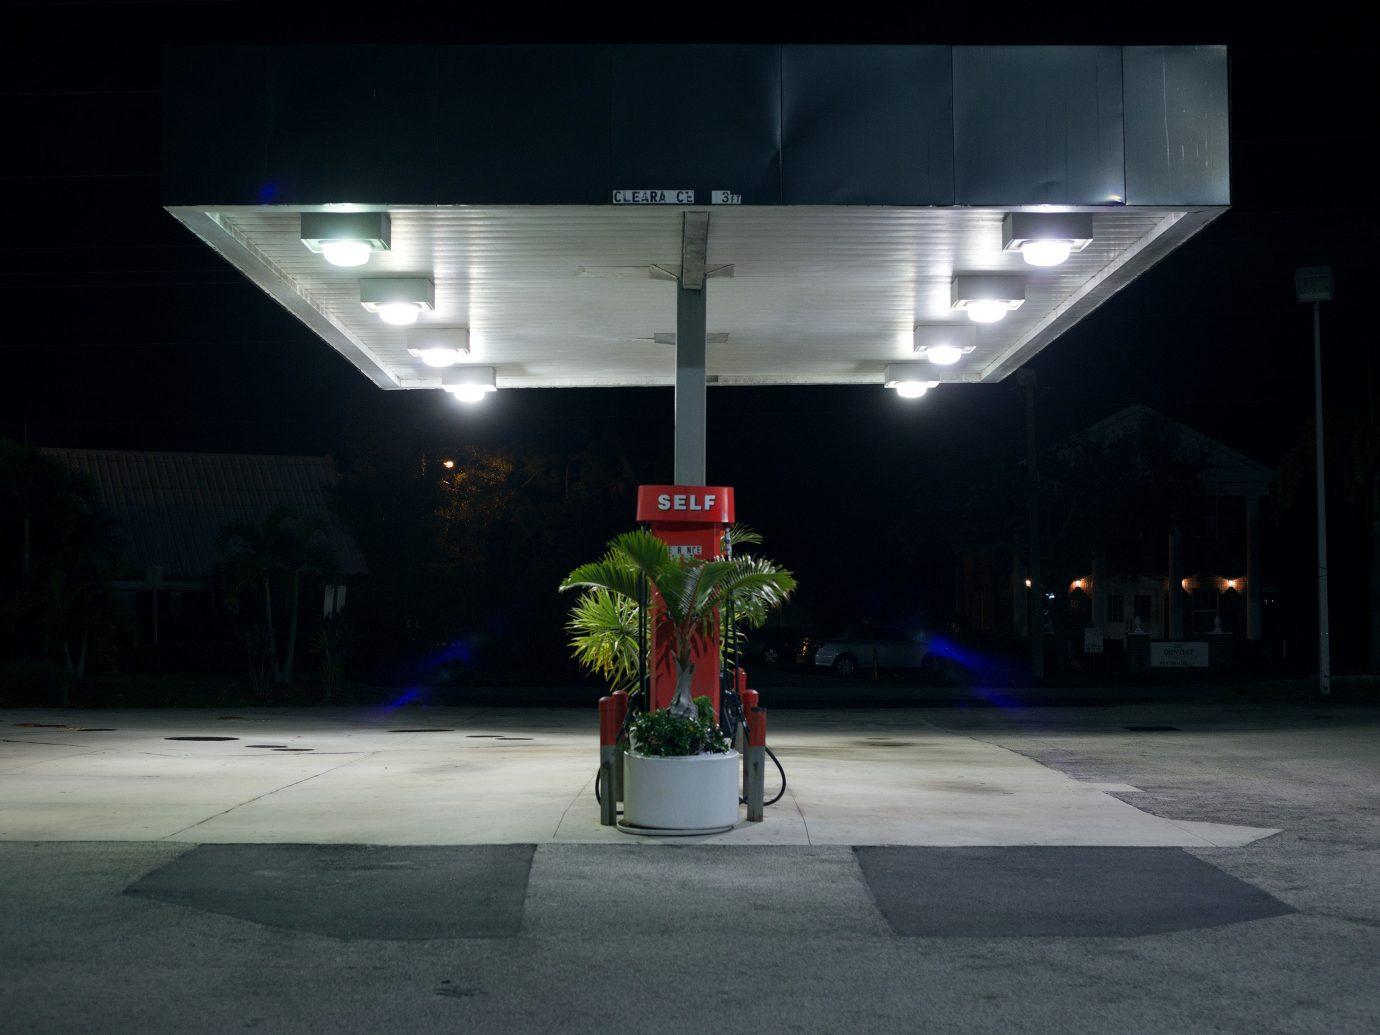 Offbeat outdoor night light darkness lighting display device light fixture screenshot shape way Design street light